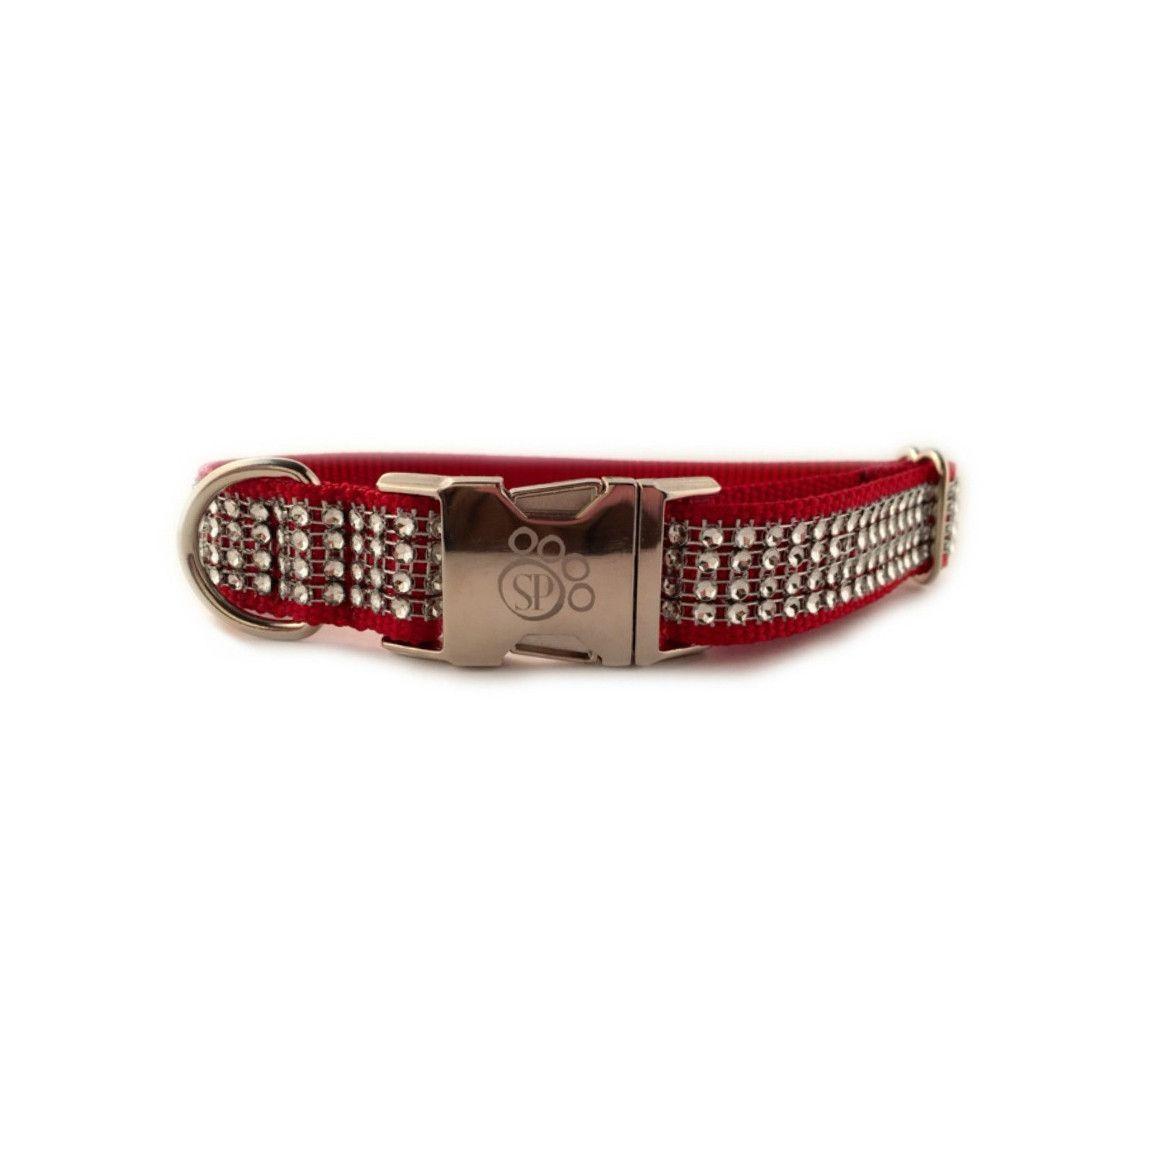 Crimson Fashion BLING Dog Collar with Metal Buckle